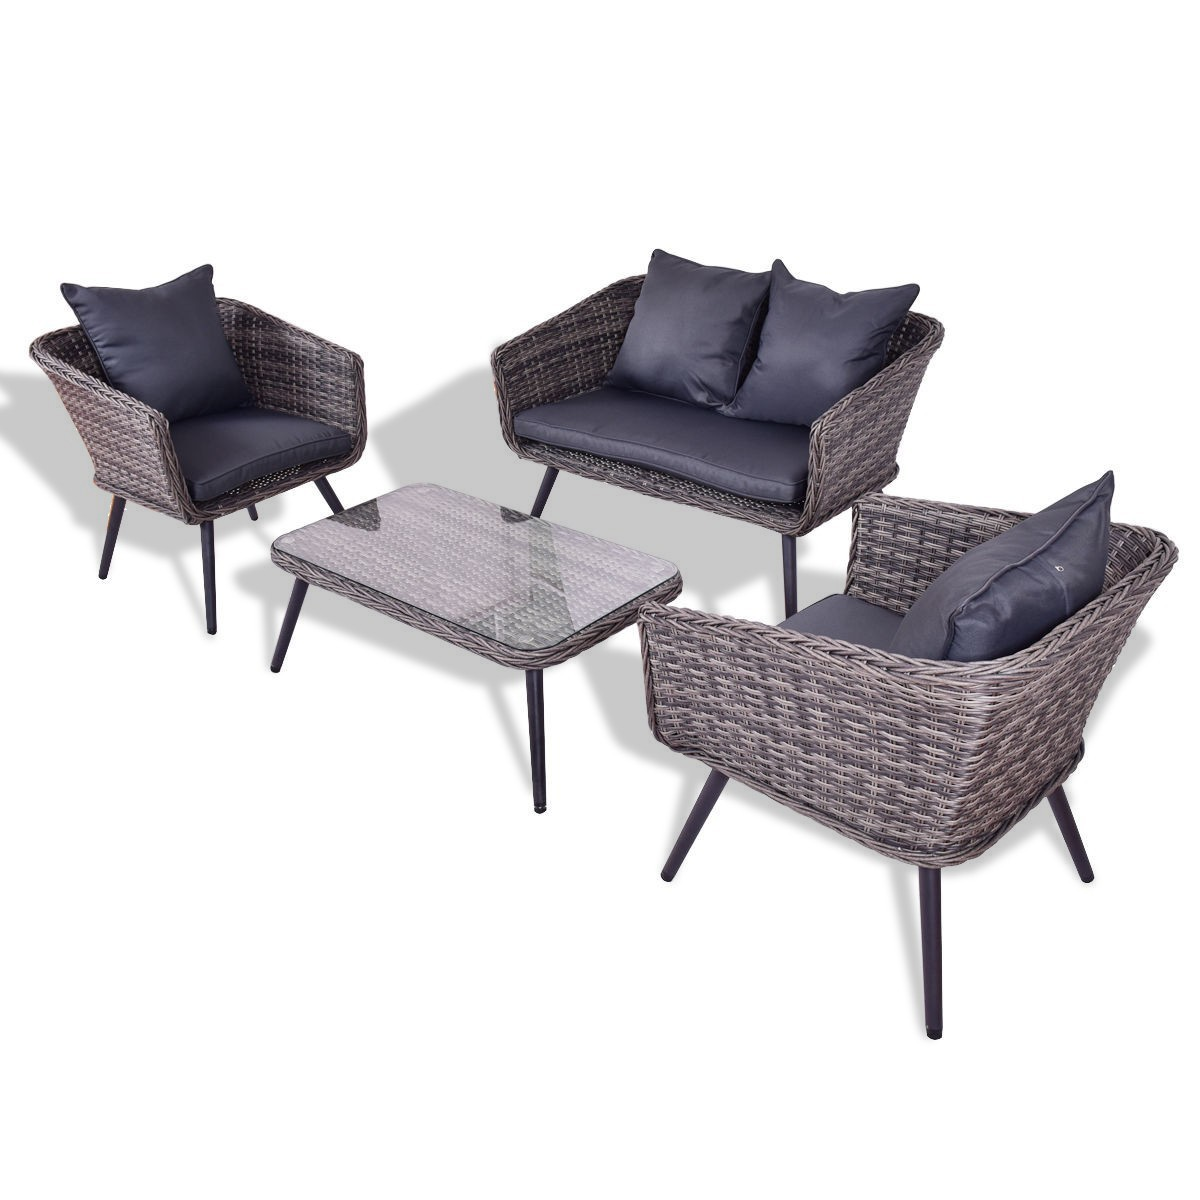 4 pcs Grey Rattan Wicker Furniture Set by